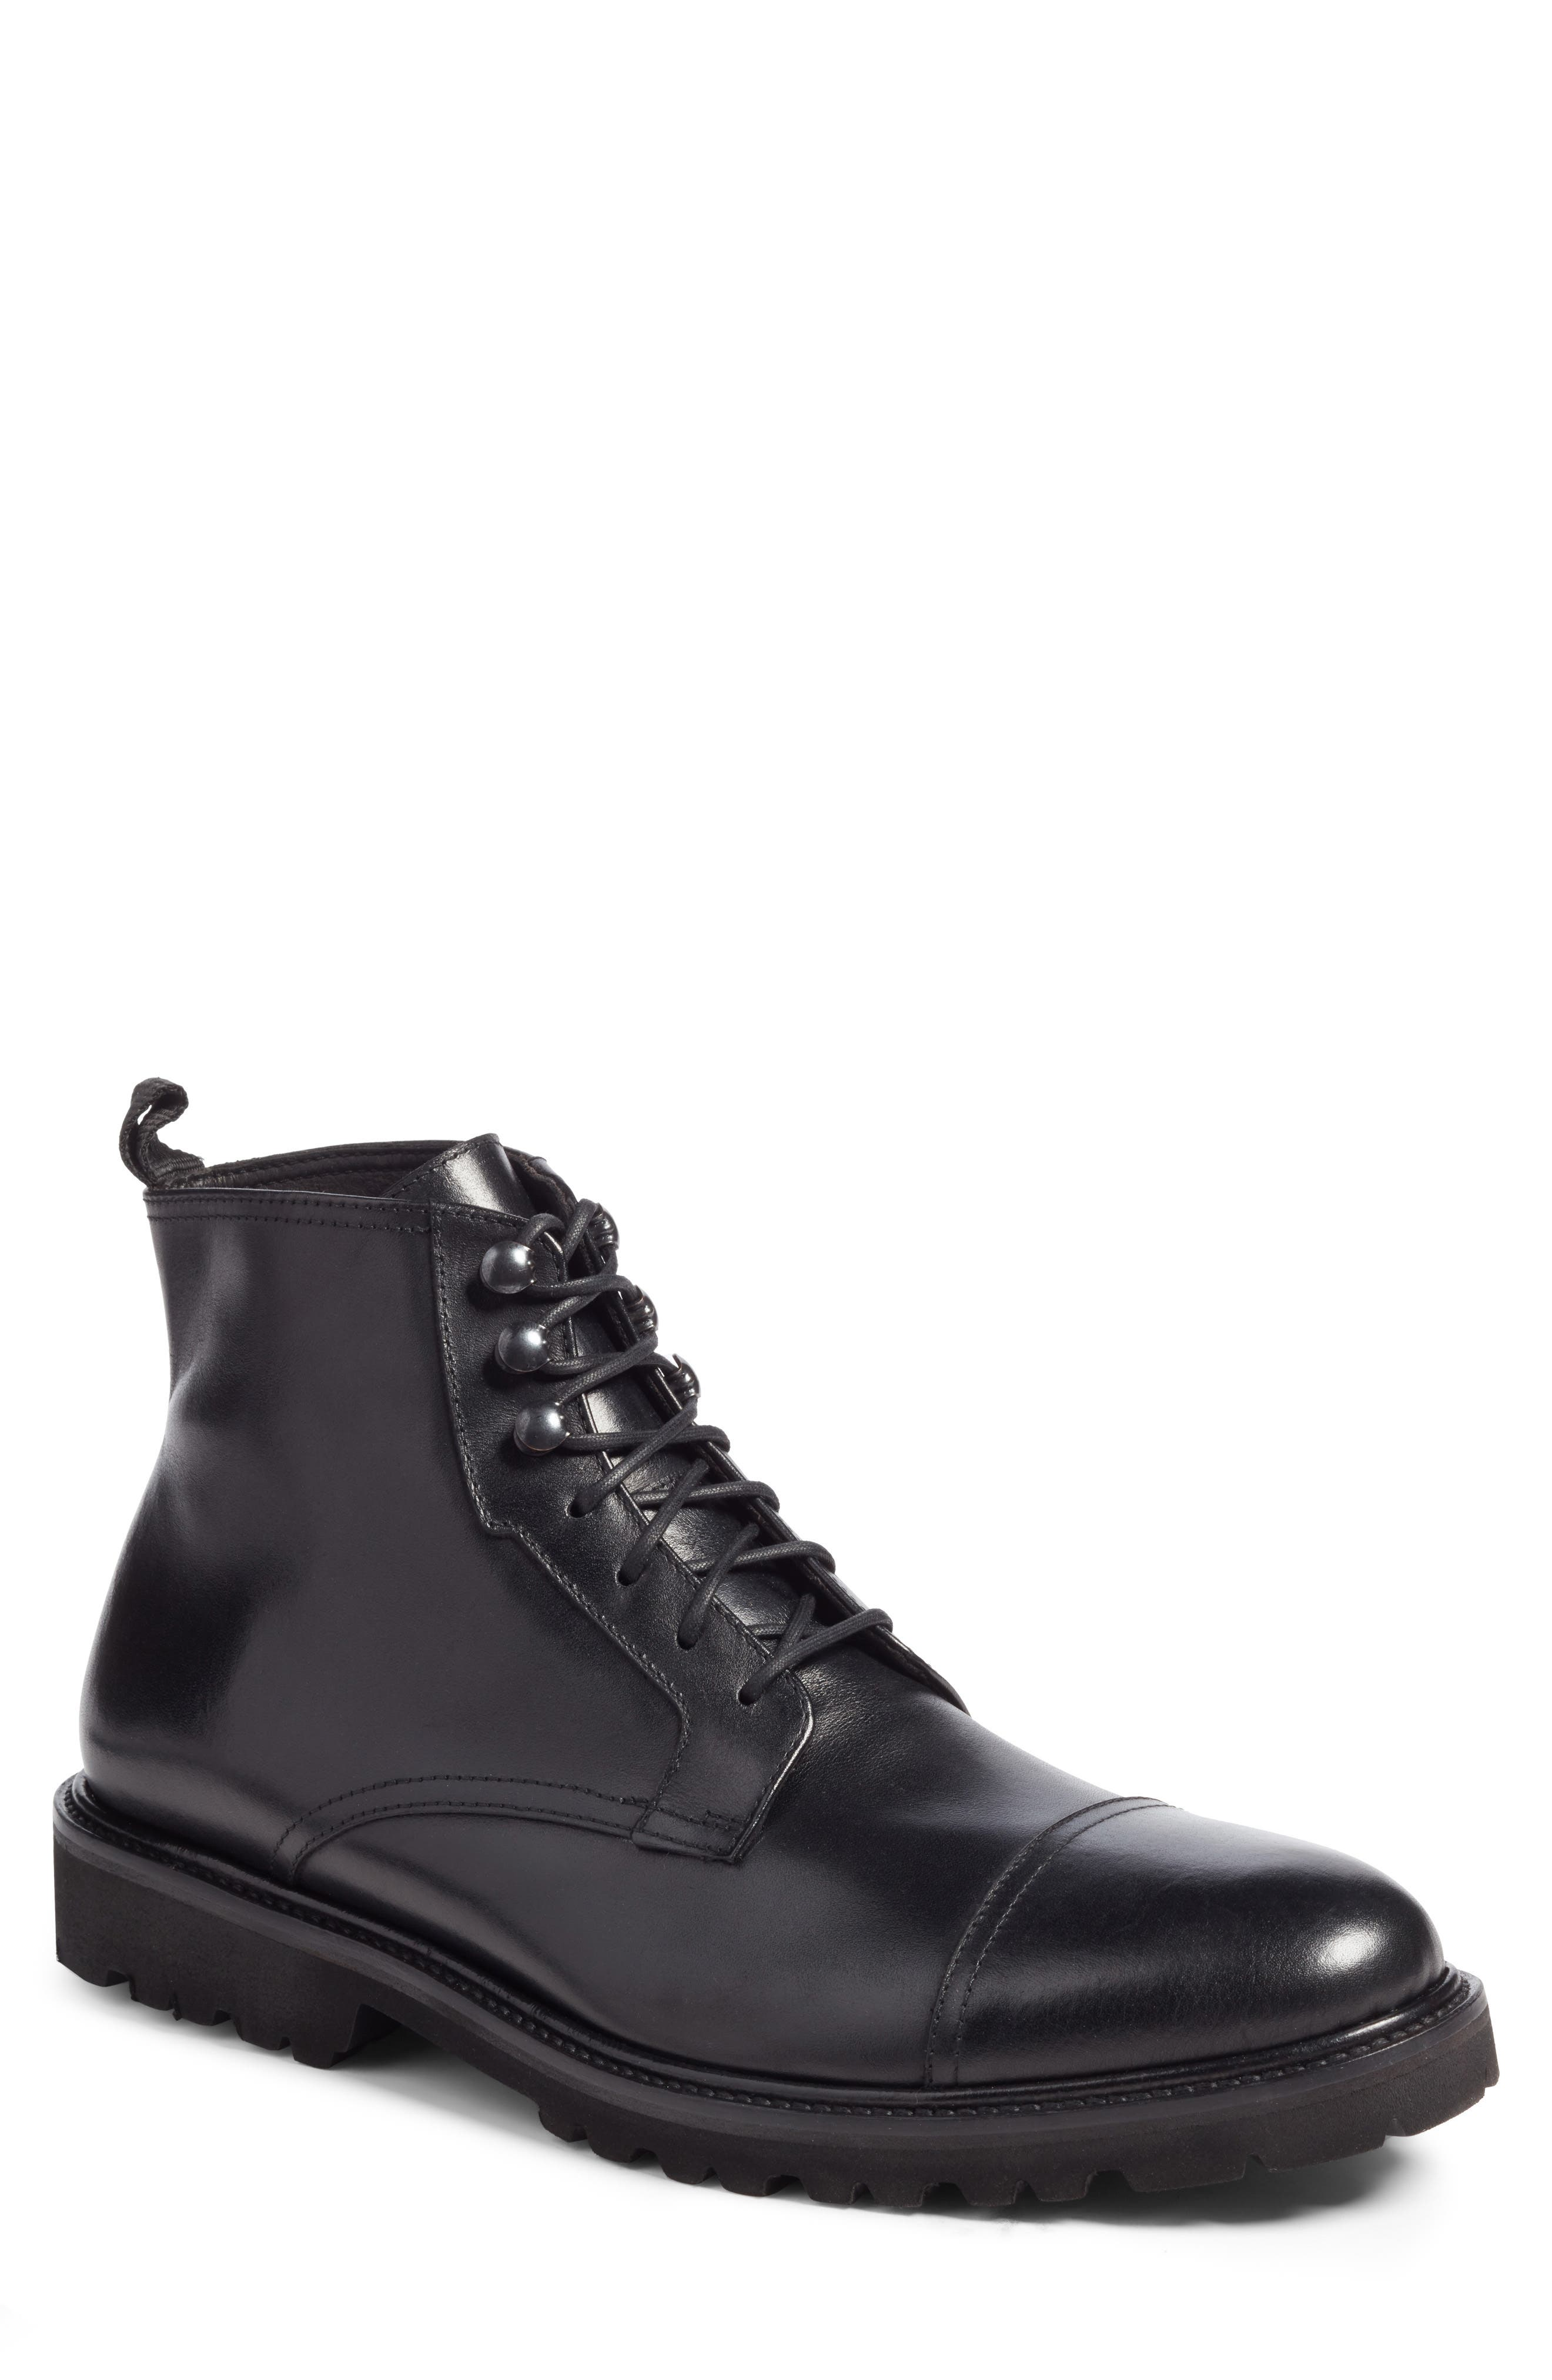 Main Image - Monte Rosso Tropea Waterproof Cap Toe Boot (Men)